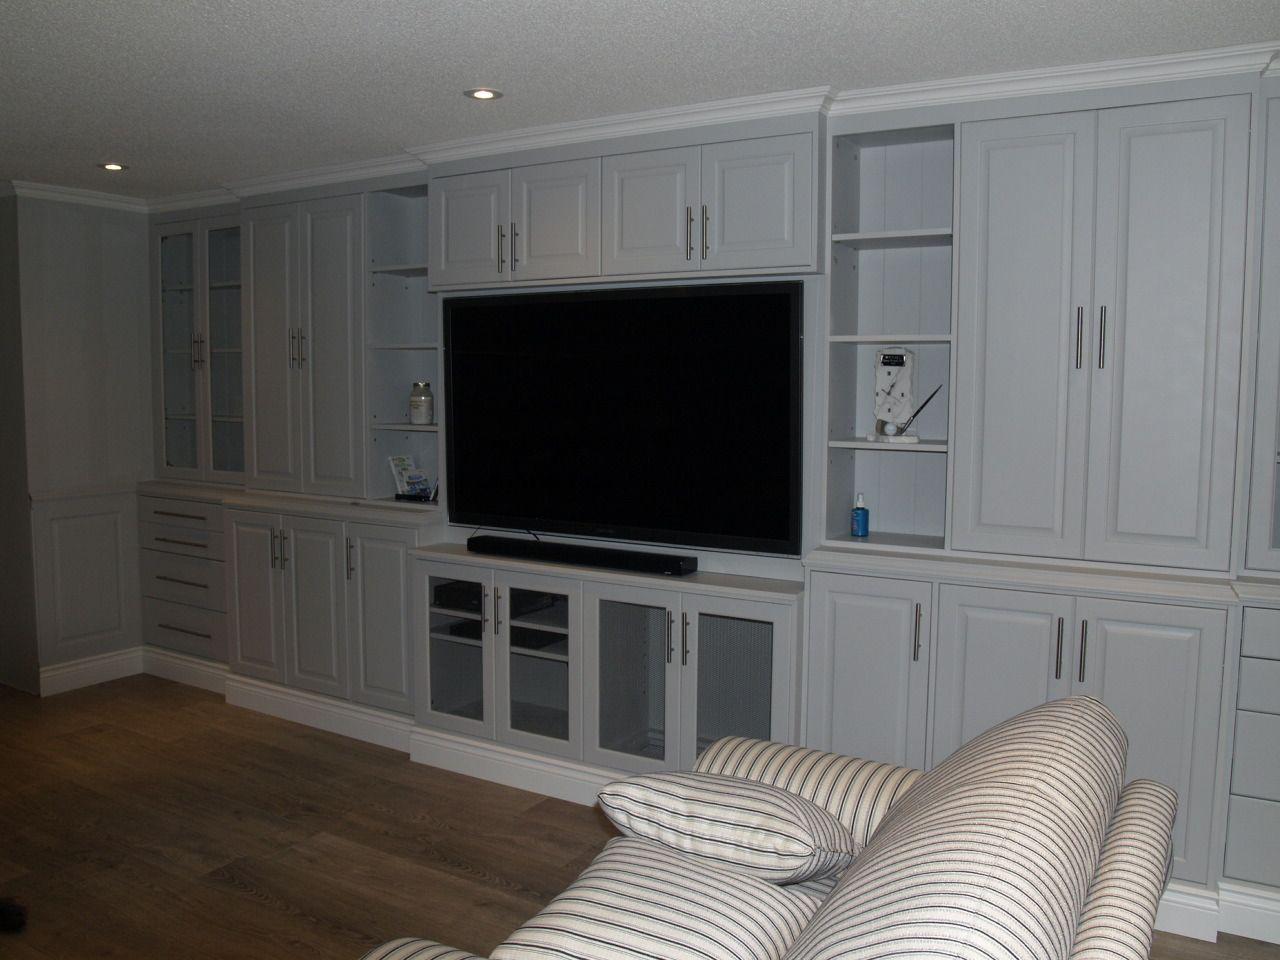 Wall Unit Built in Wall Units painted furniture custom furntiure solid wood furniture